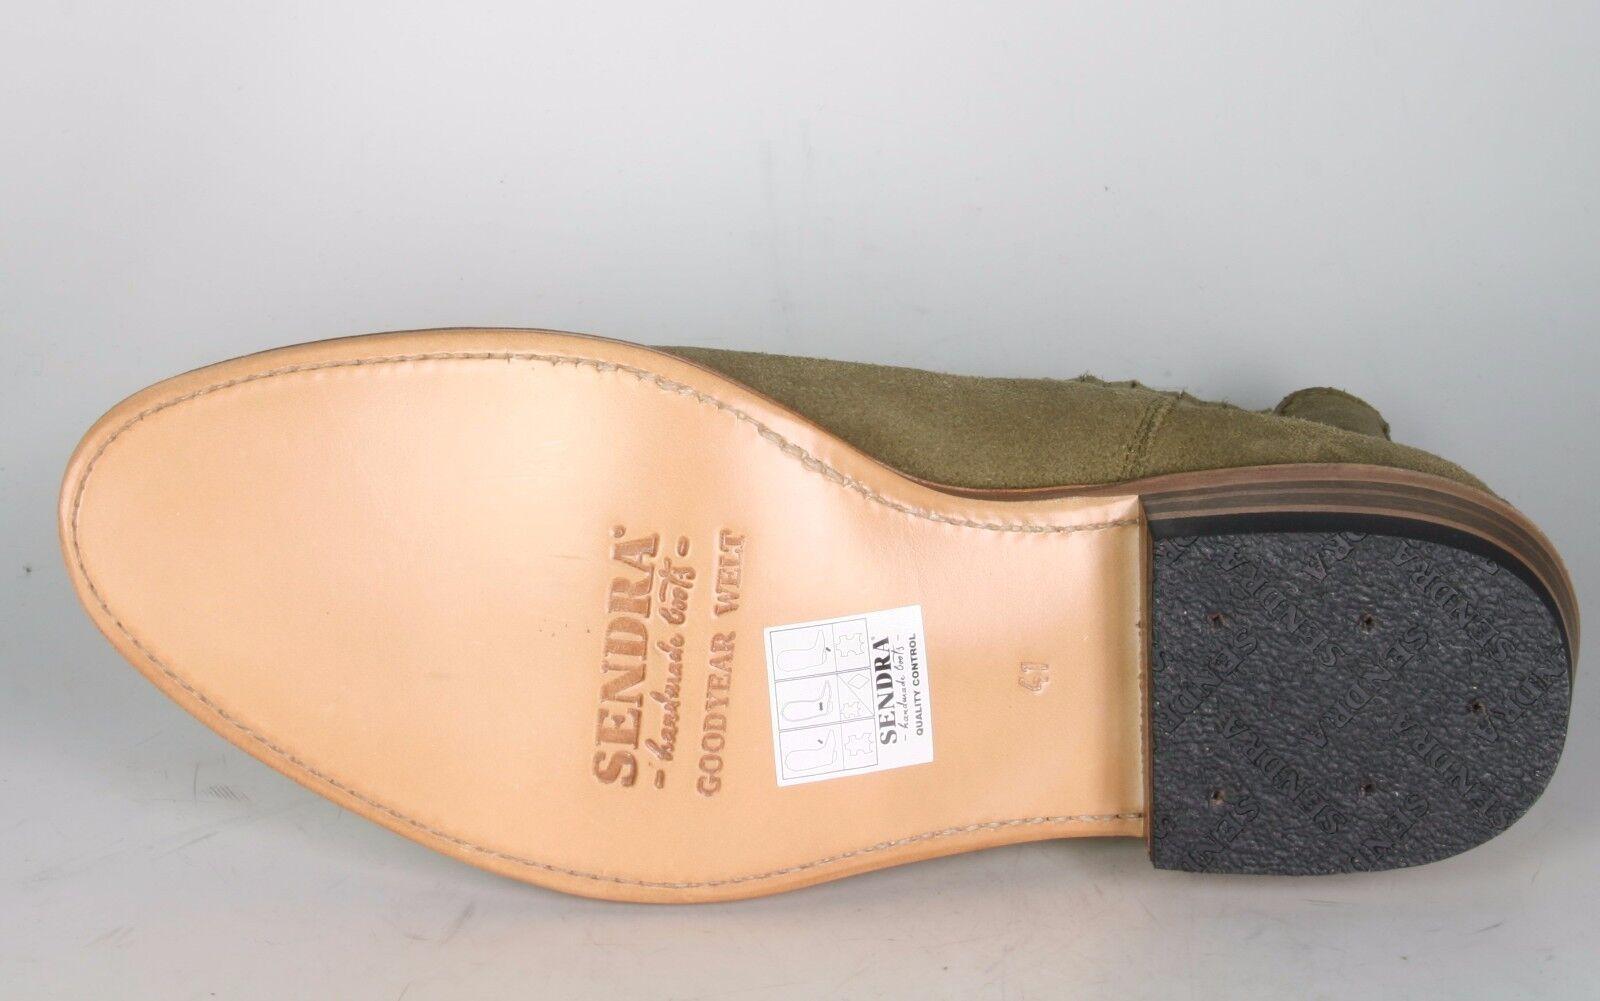 11336 Sendra Wildleder Stiefeletten KASS Serr. Fango Wildleder Sendra Rahmengenähte Schuhe d09874